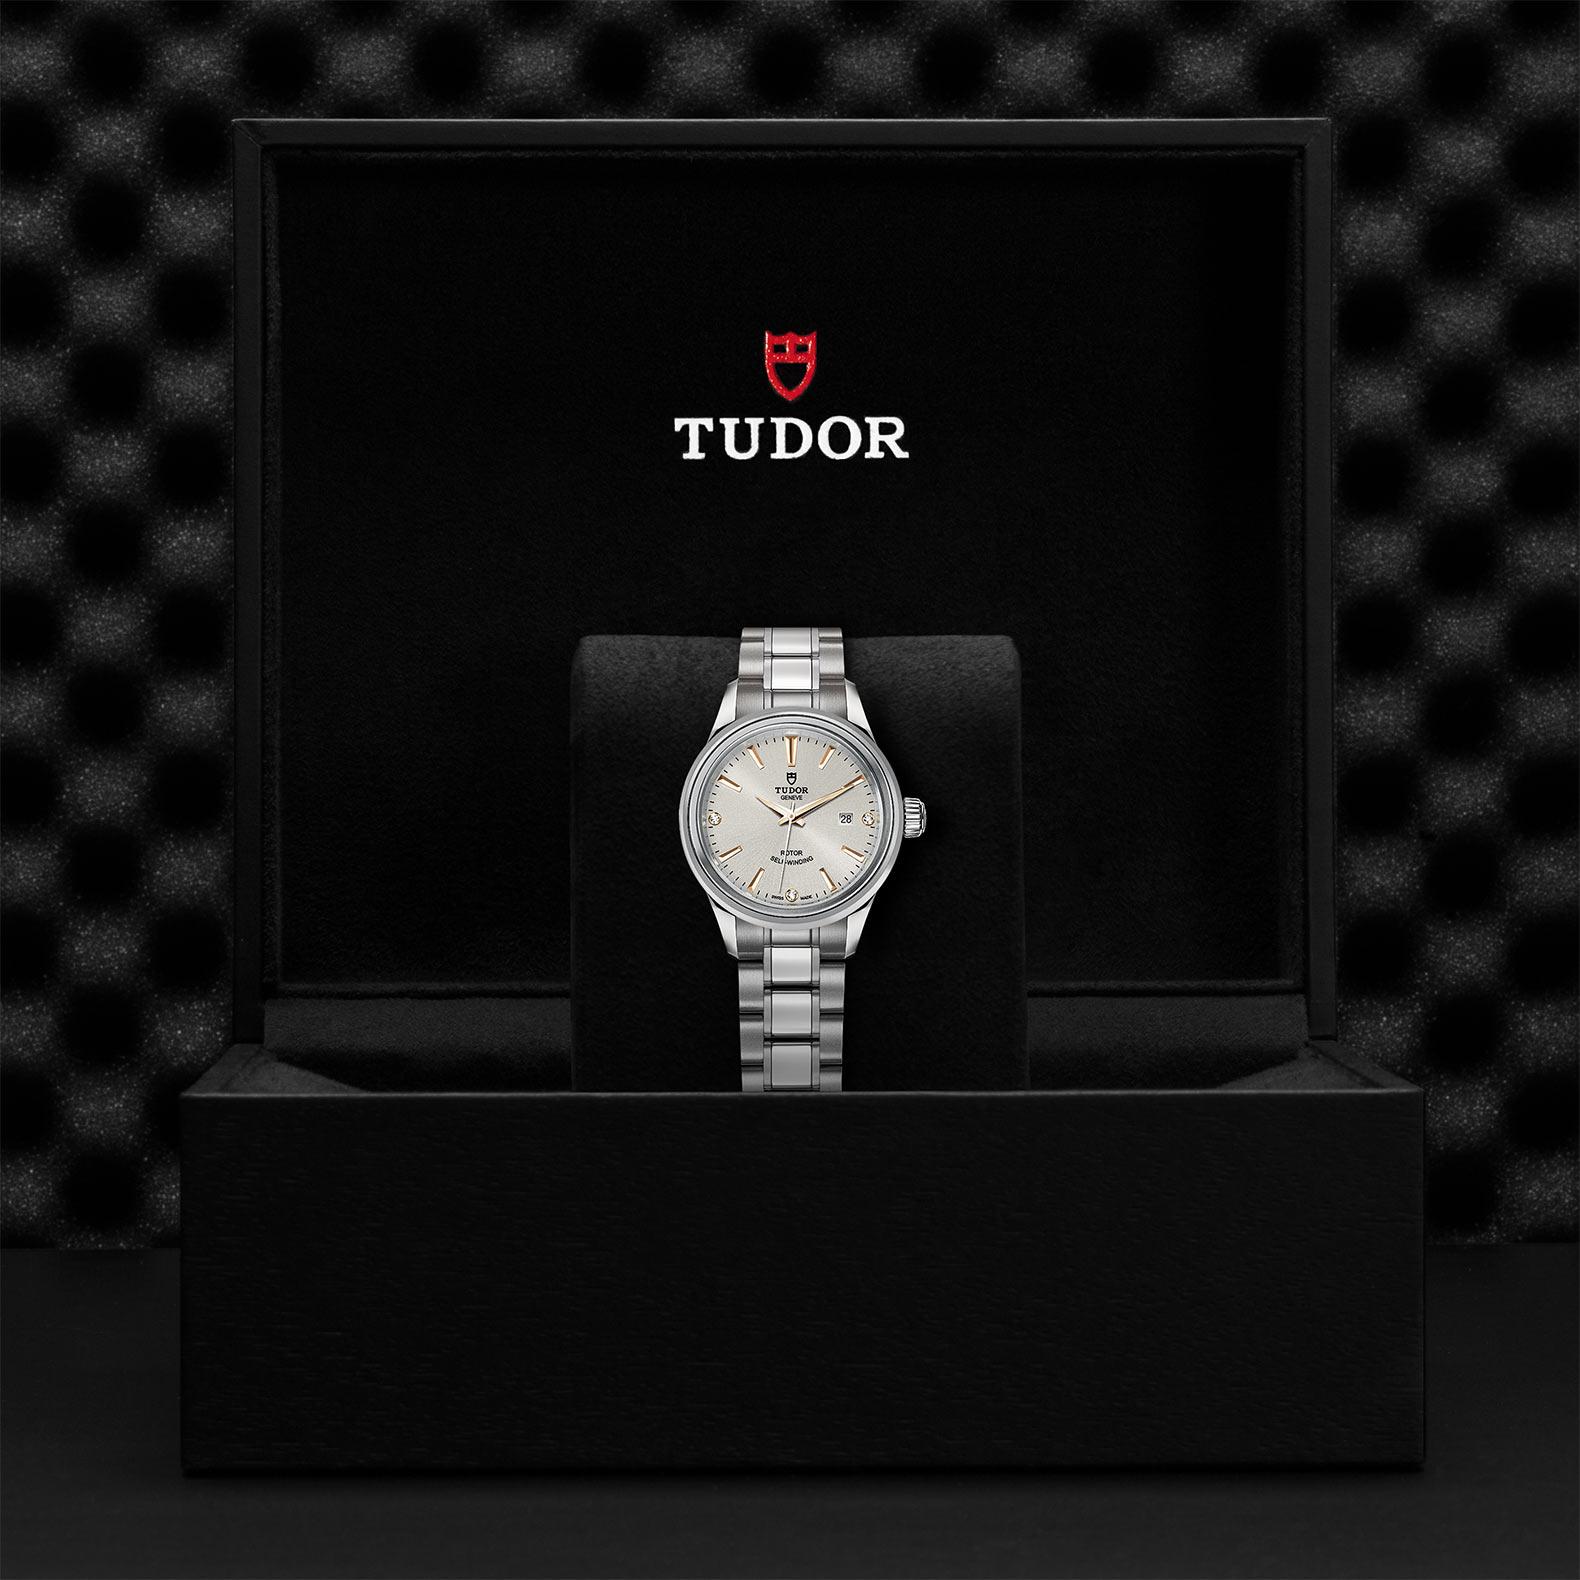 TUDOR Style M12100 0019 Presentationbox